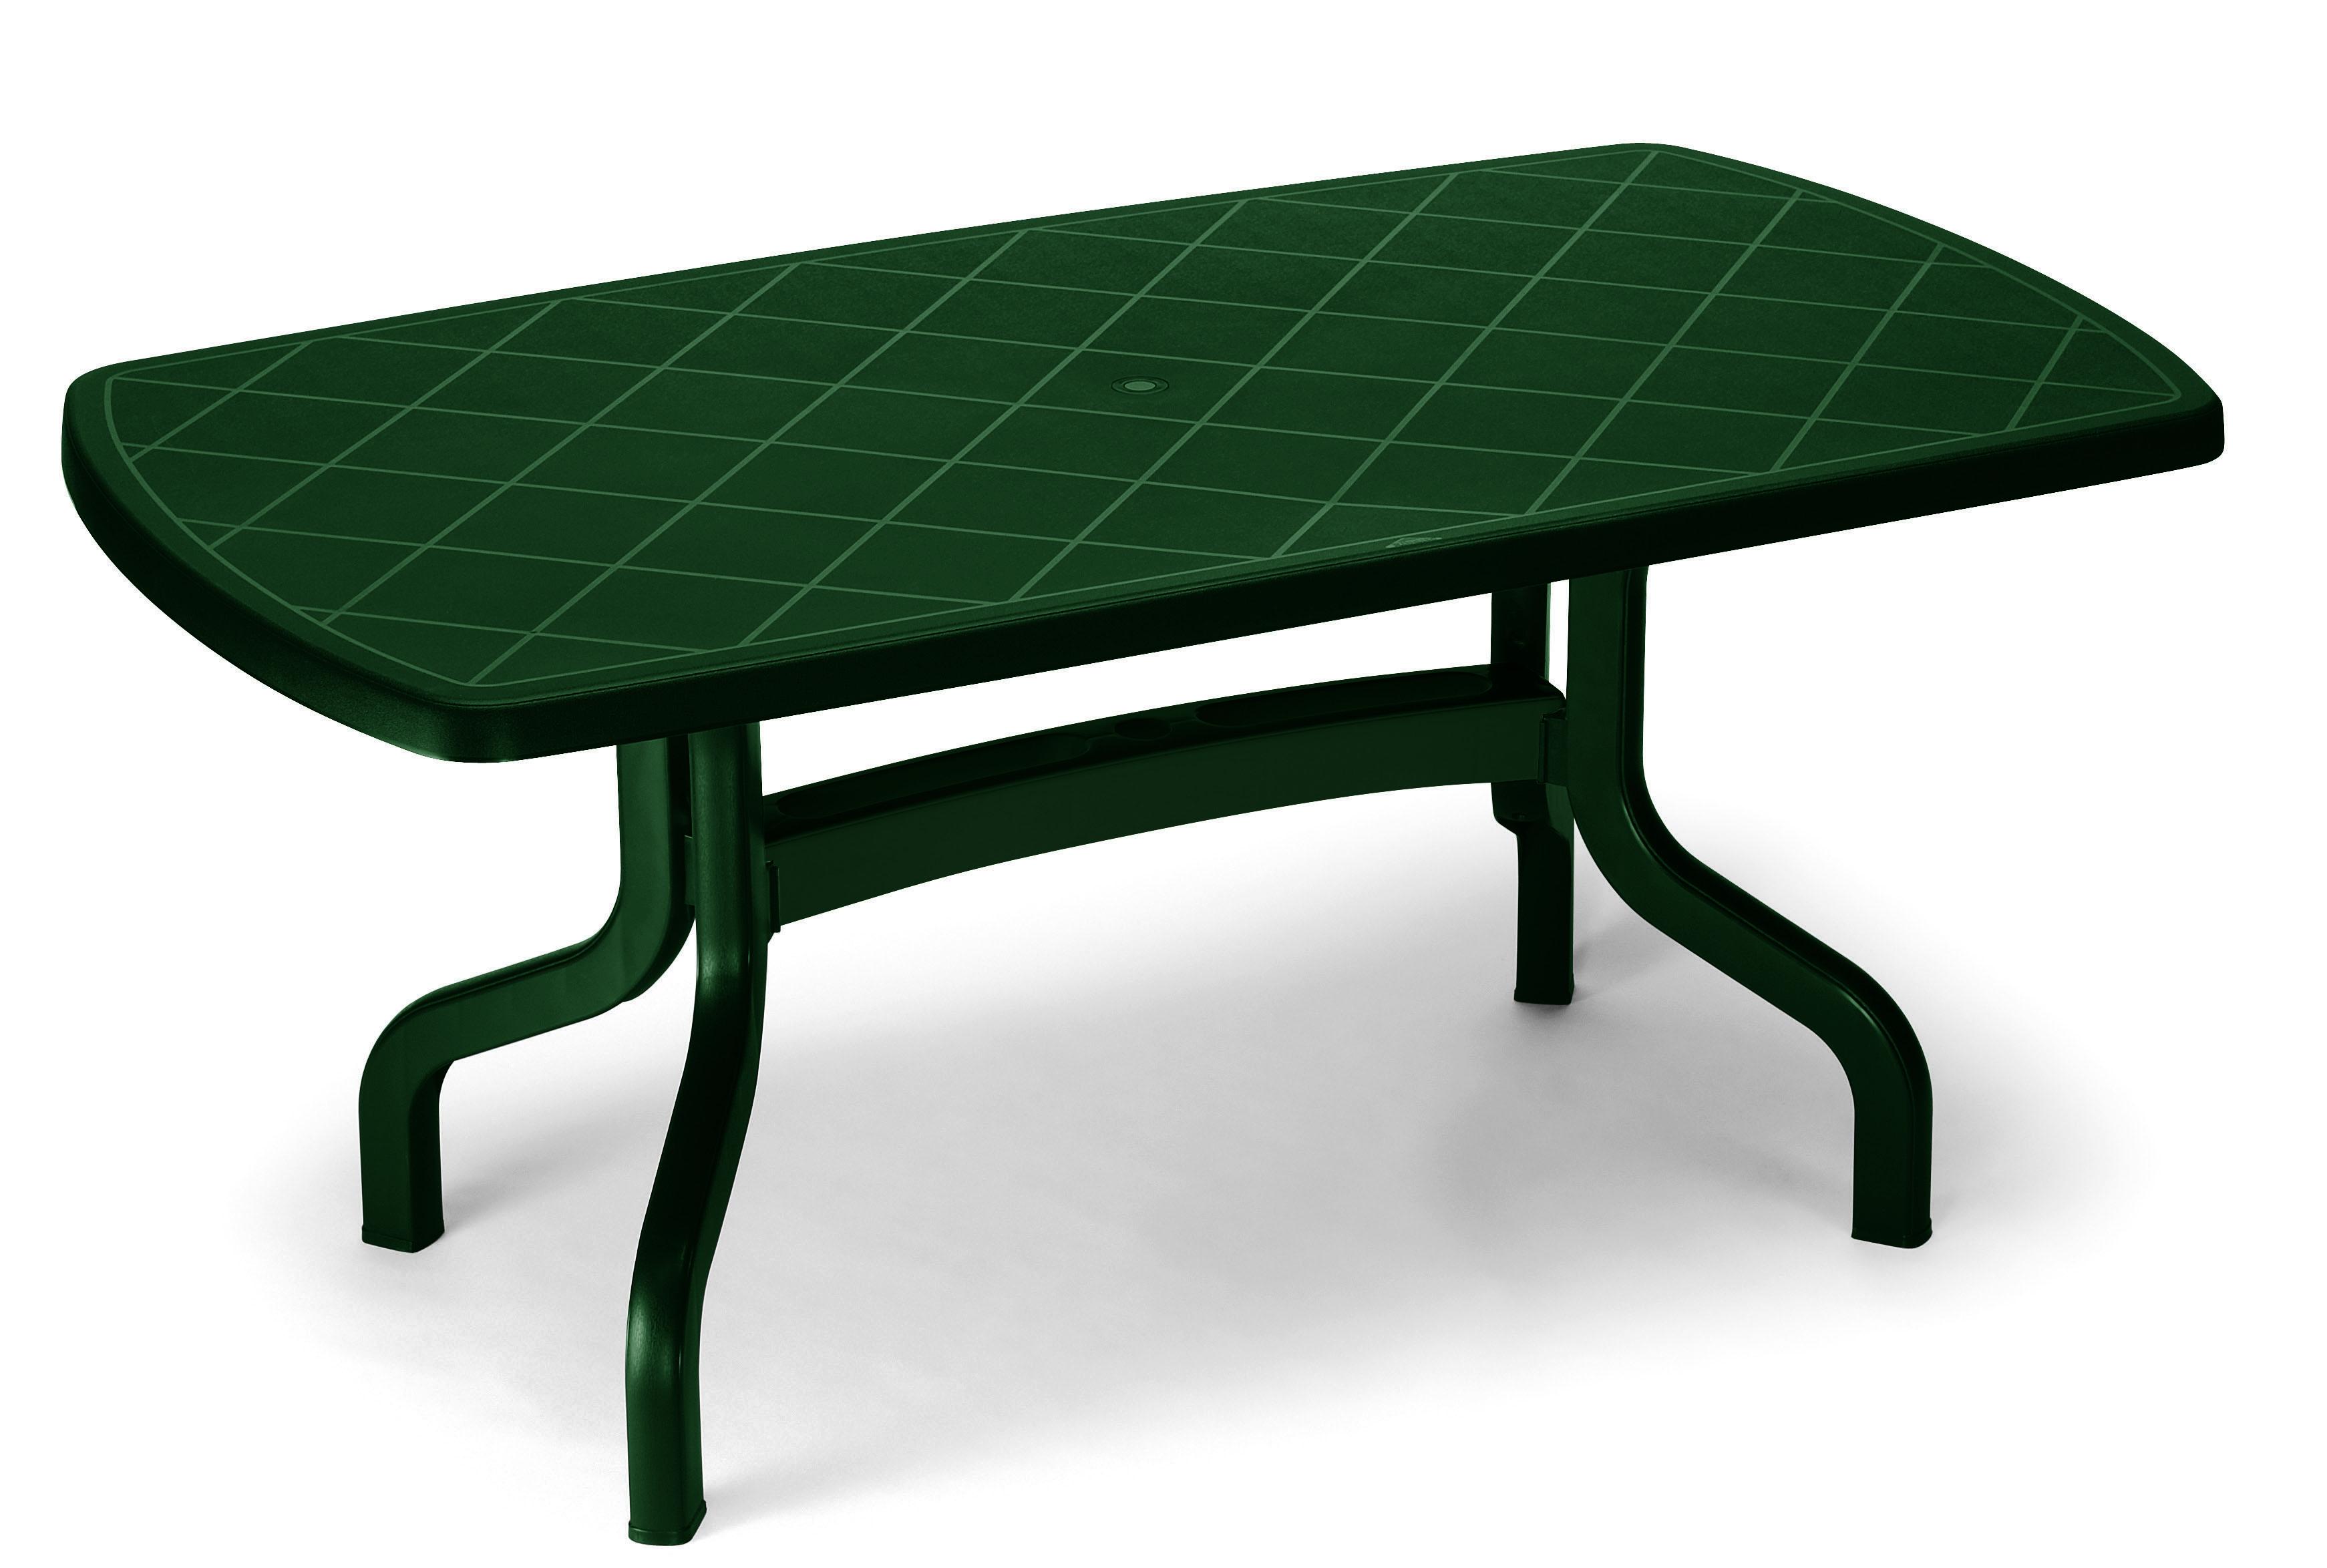 Tavoli Verde Da Giardino.Tavolo Da Giardino Ribalto 160 X 90 Contract In Resina By Scab Arredo Giardino Com